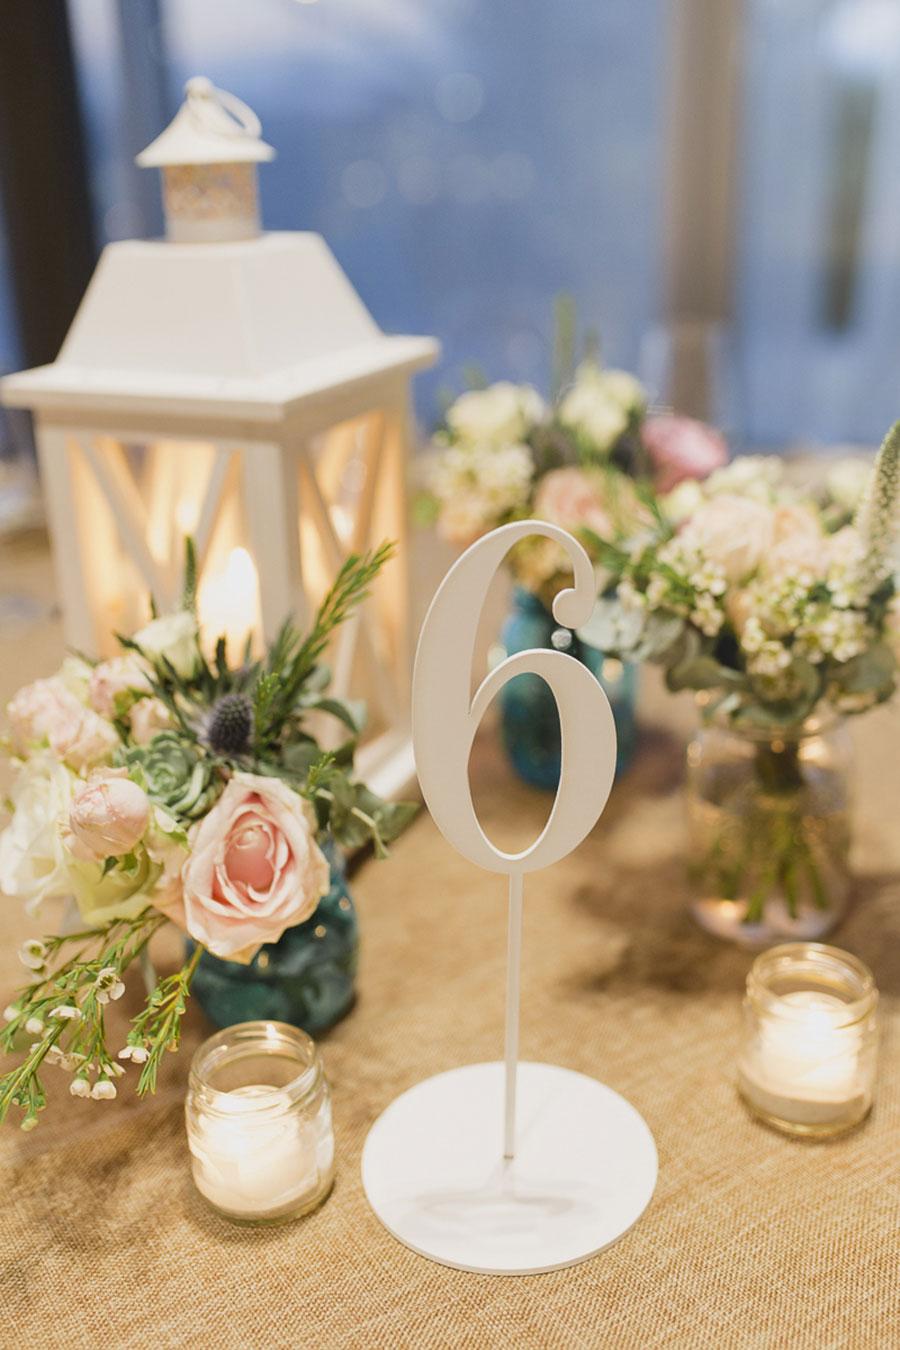 Wedding-Nicholad-and-Federica-Giuseppe-Giovannelli-36